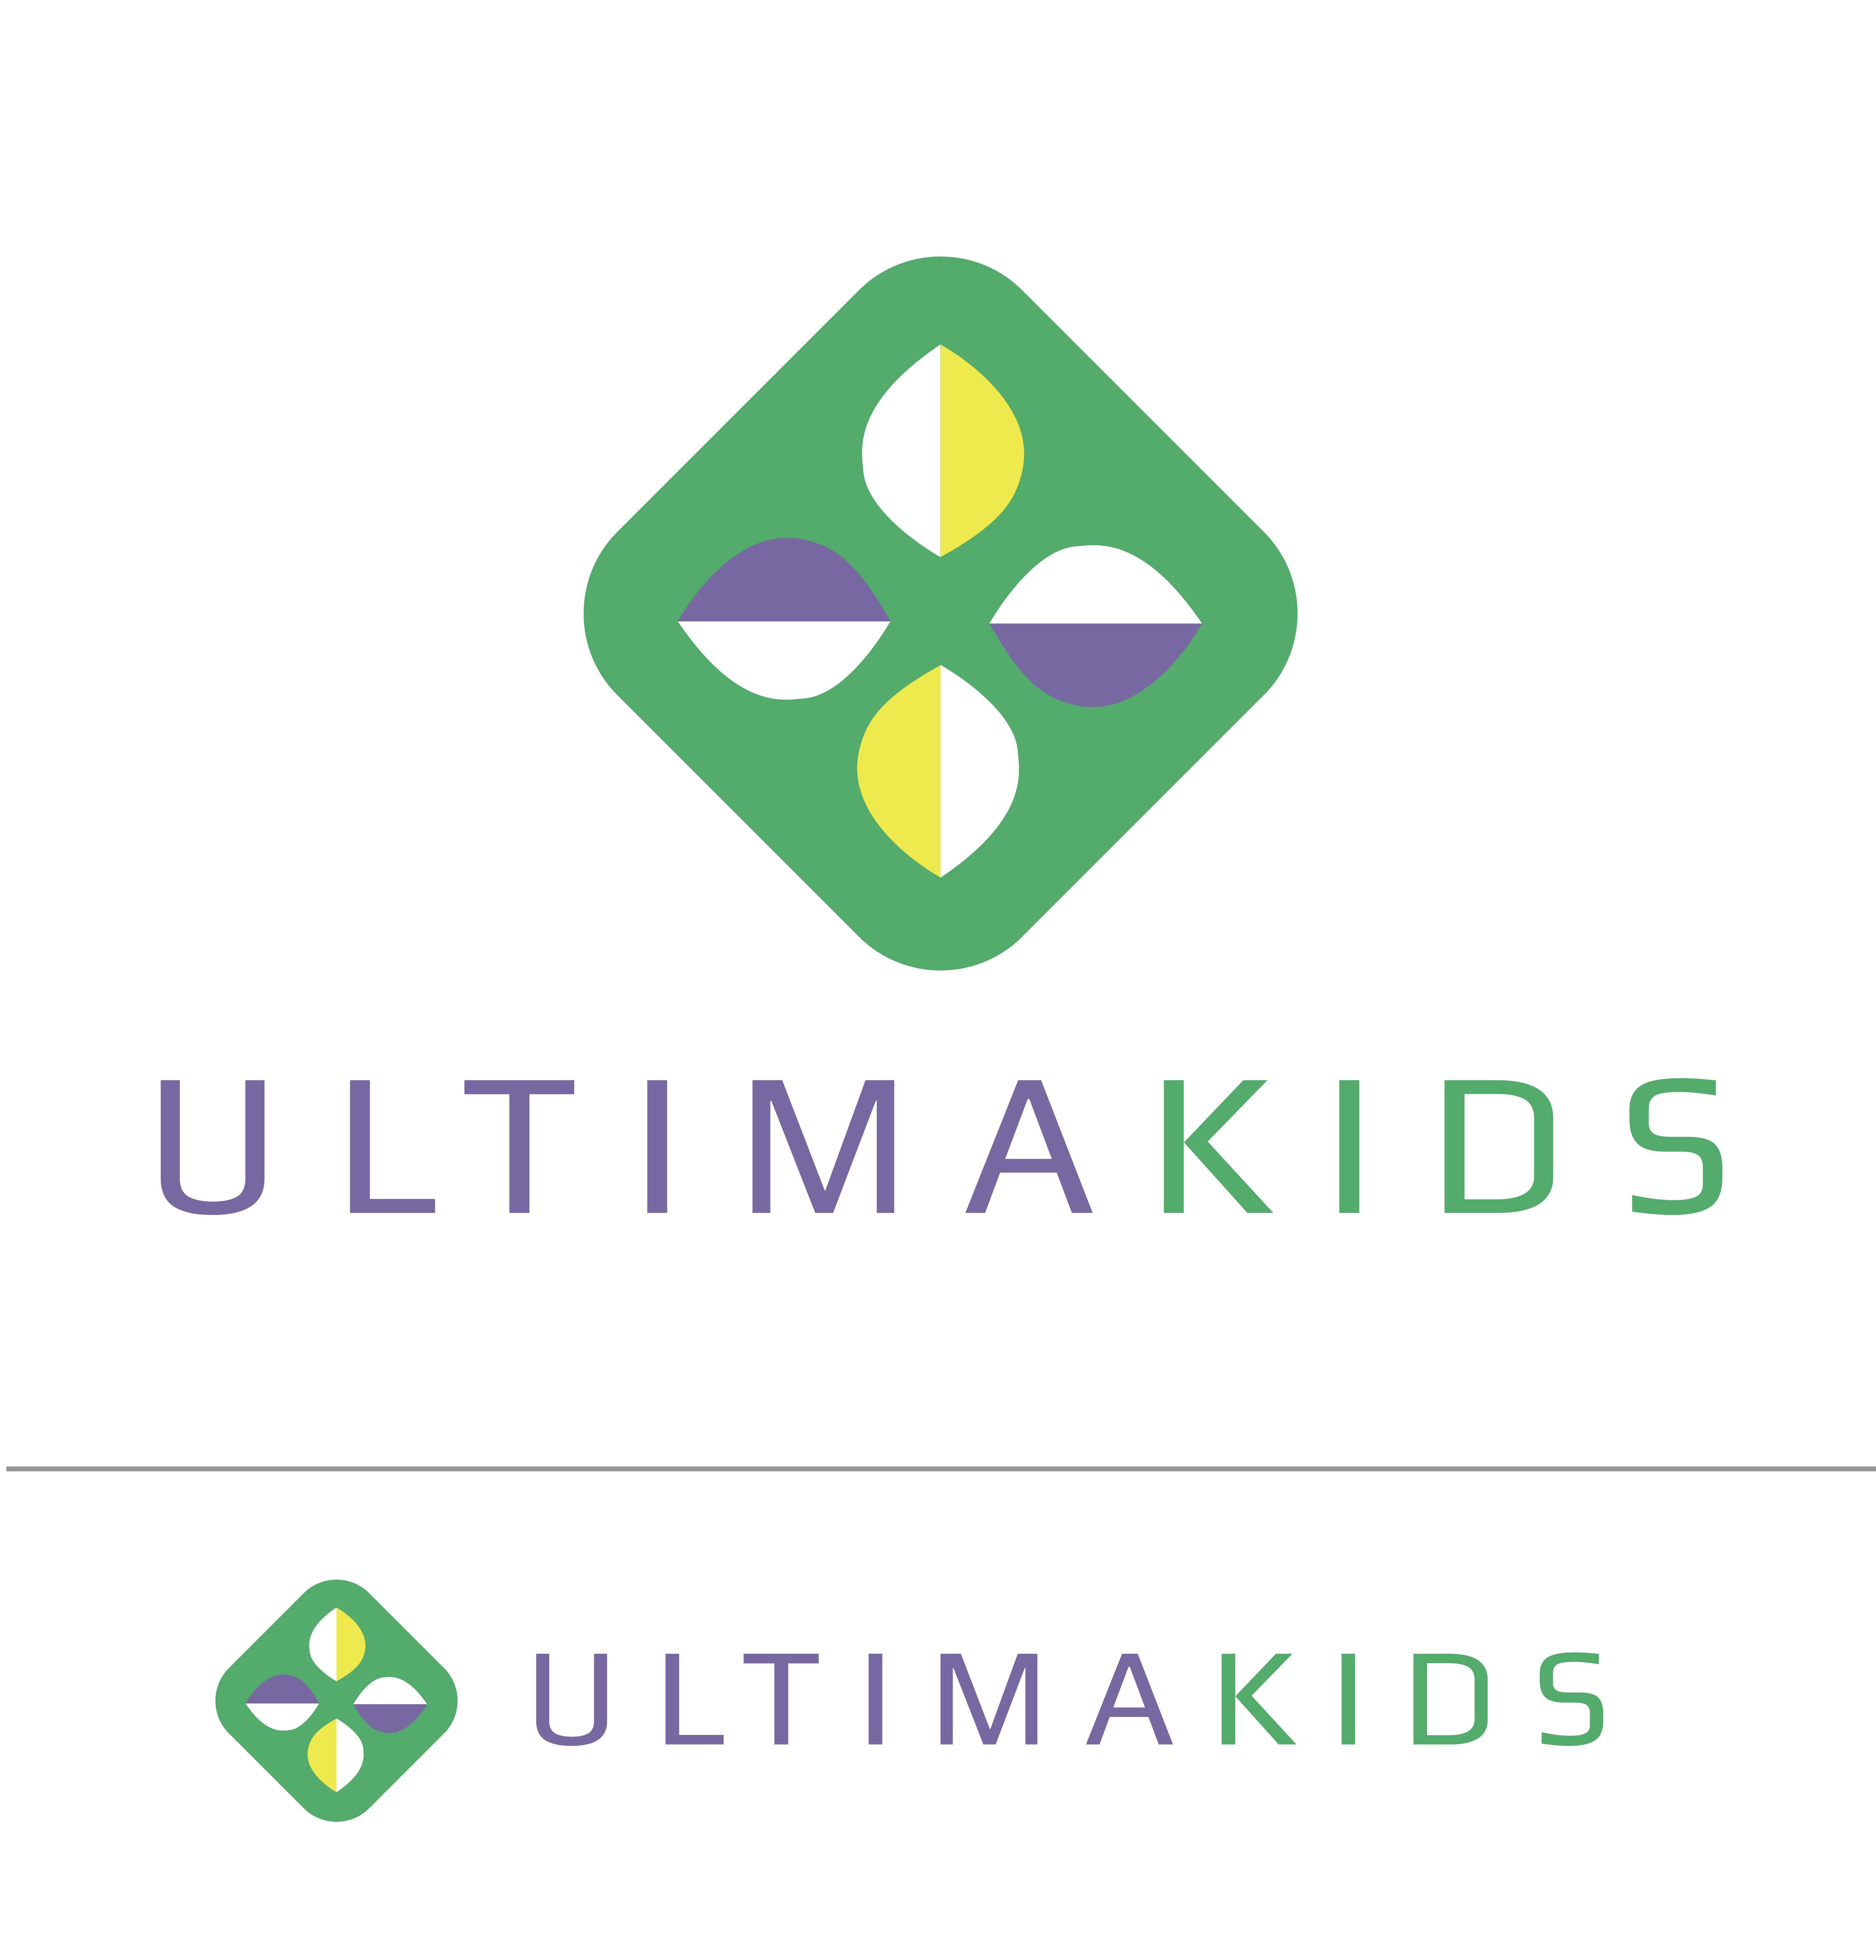 Дизайн логотипа для детского магазина фото f_3165bc5c8c4327df.jpg